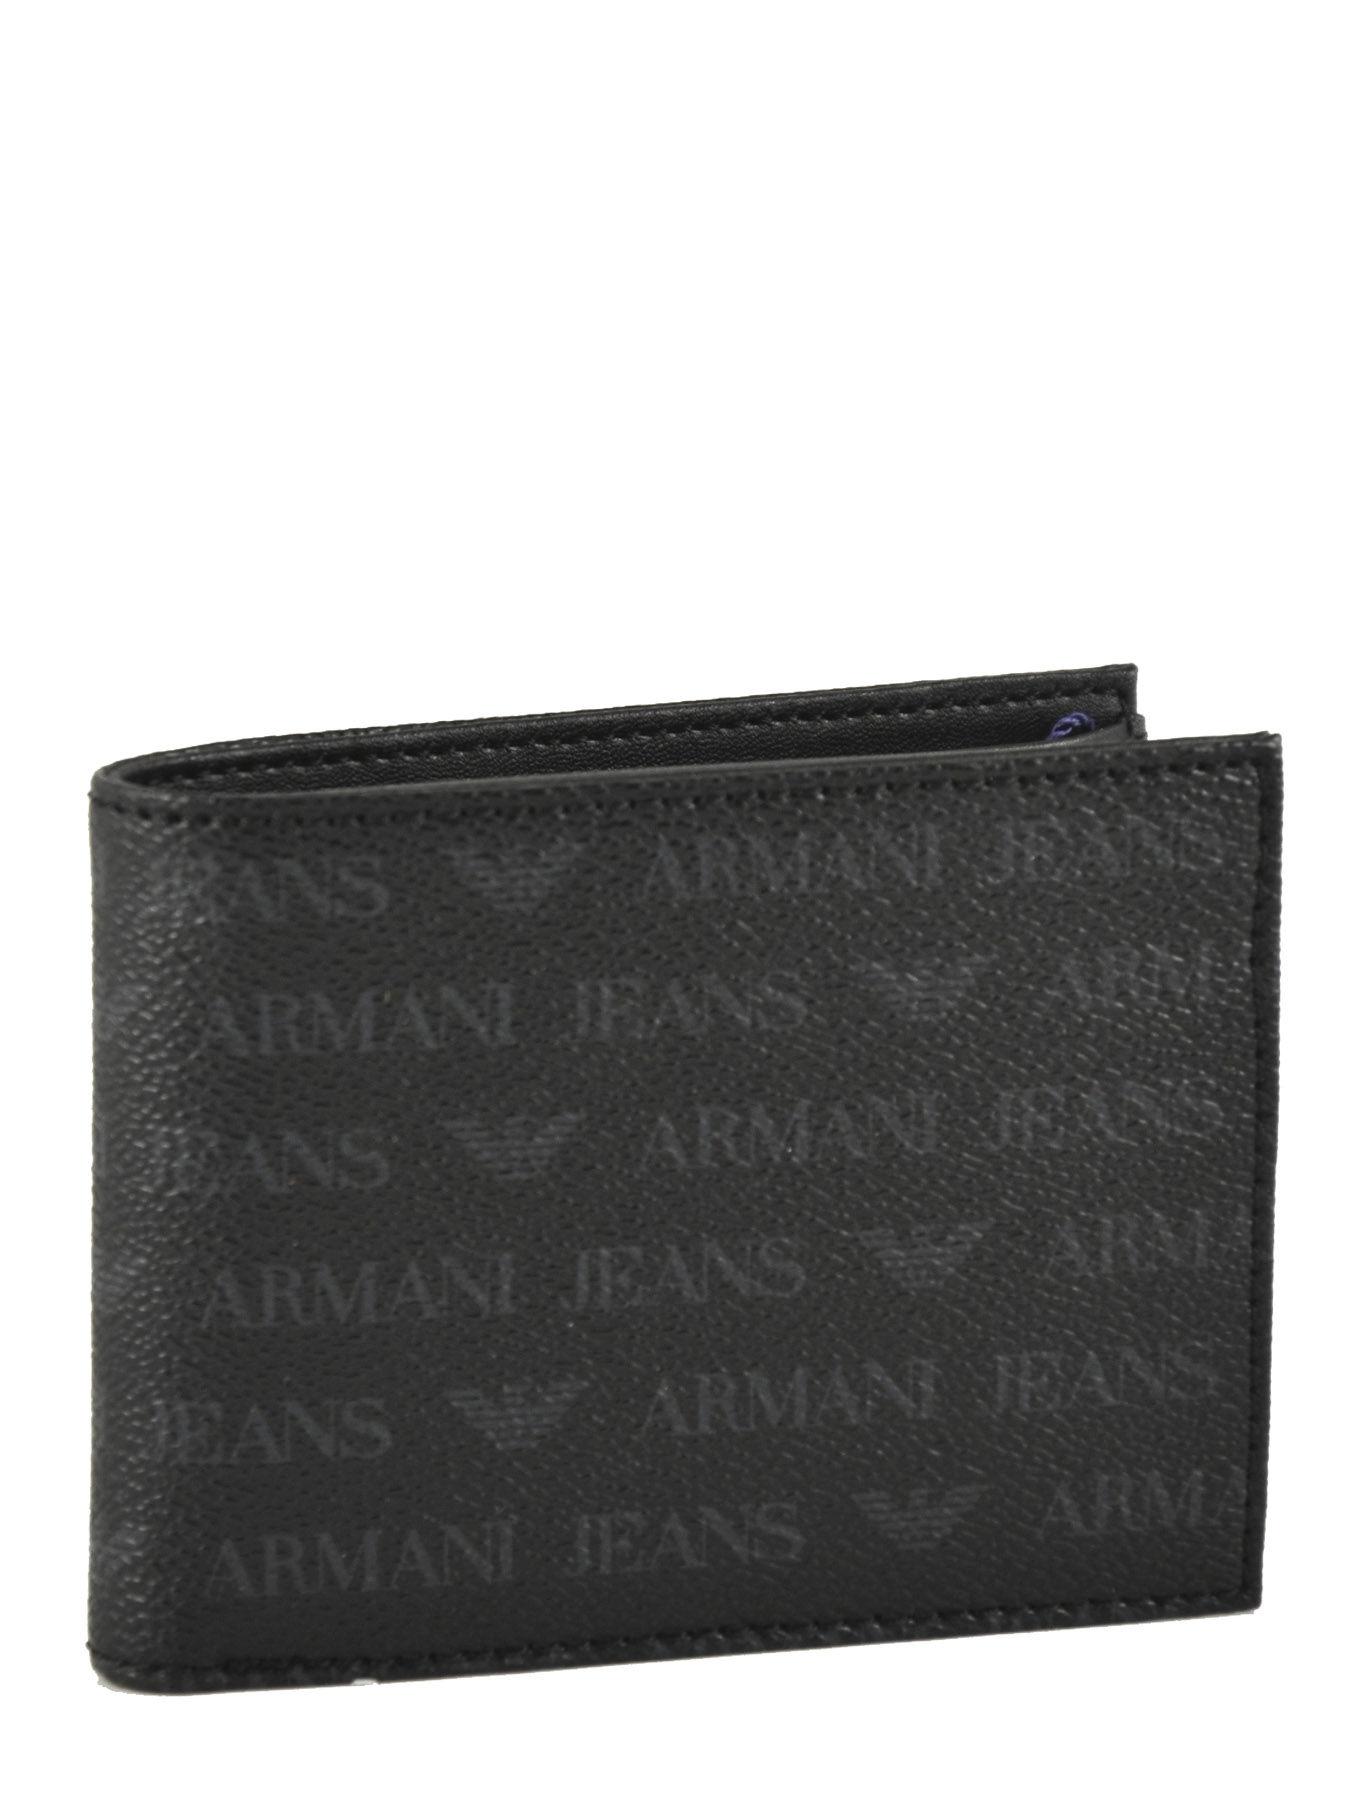 Armani jeans coupon code